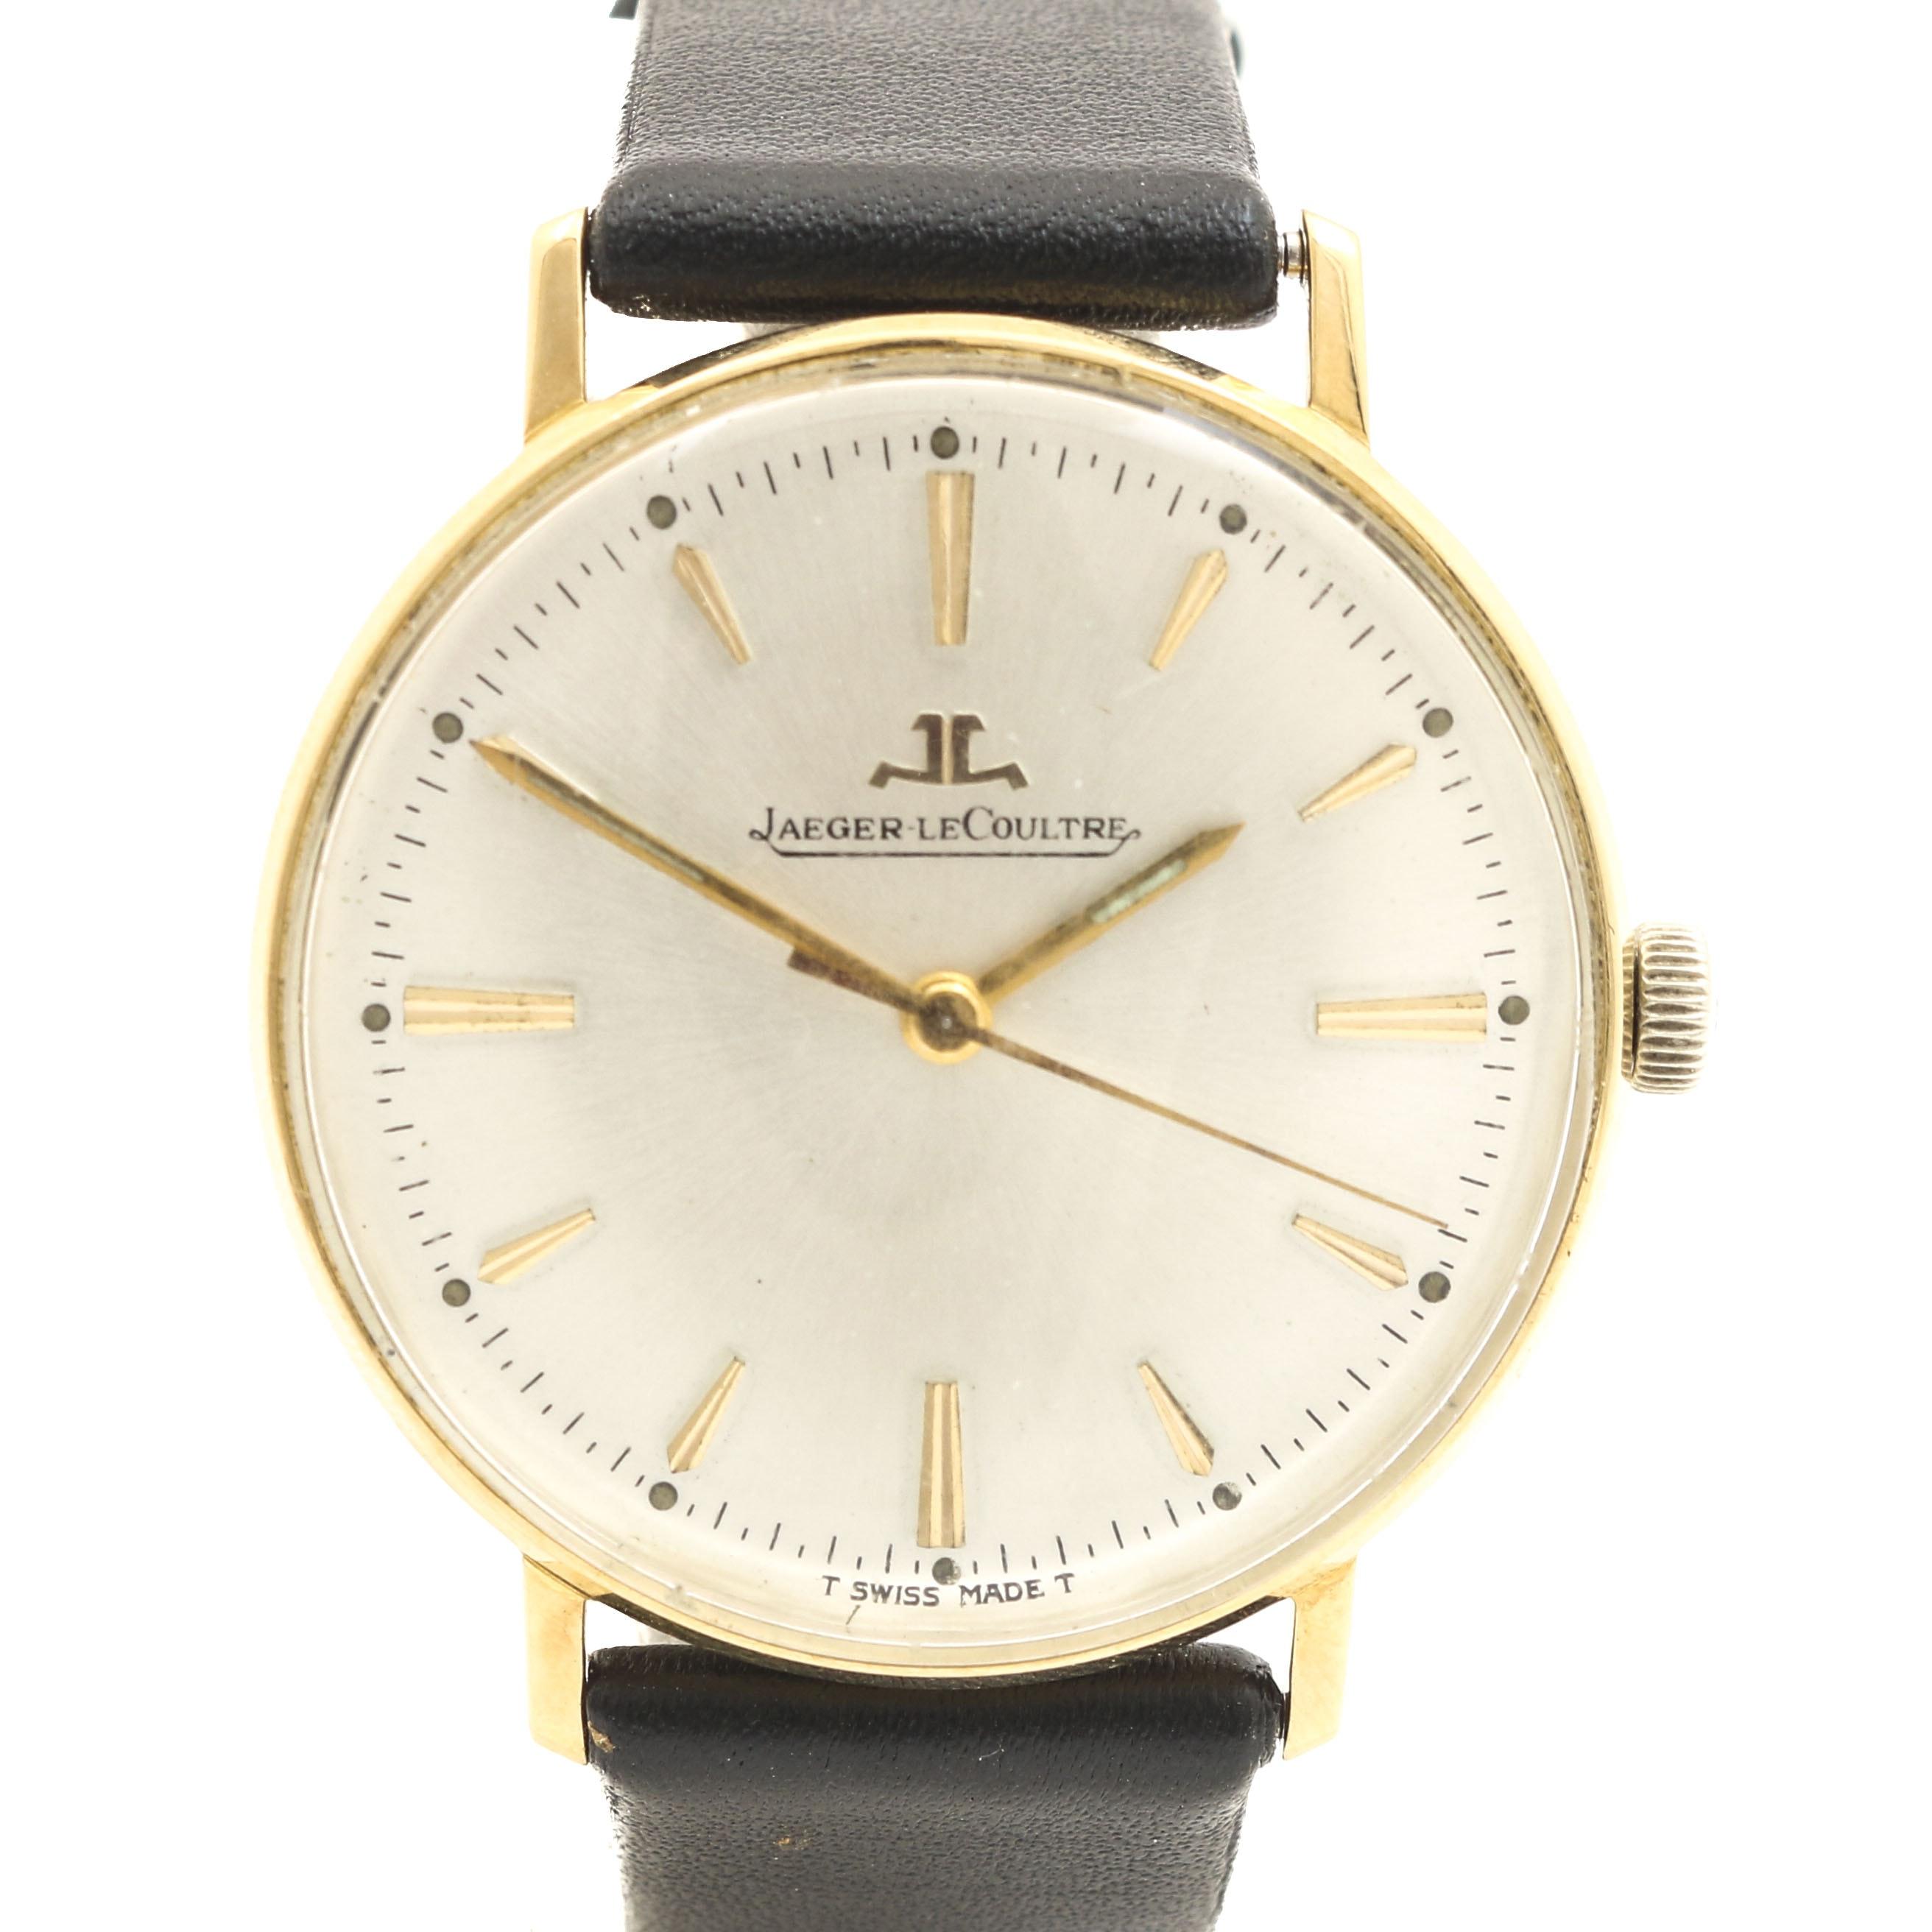 Jaeger LeCoultre 18K Yellow Gold Wristwatch